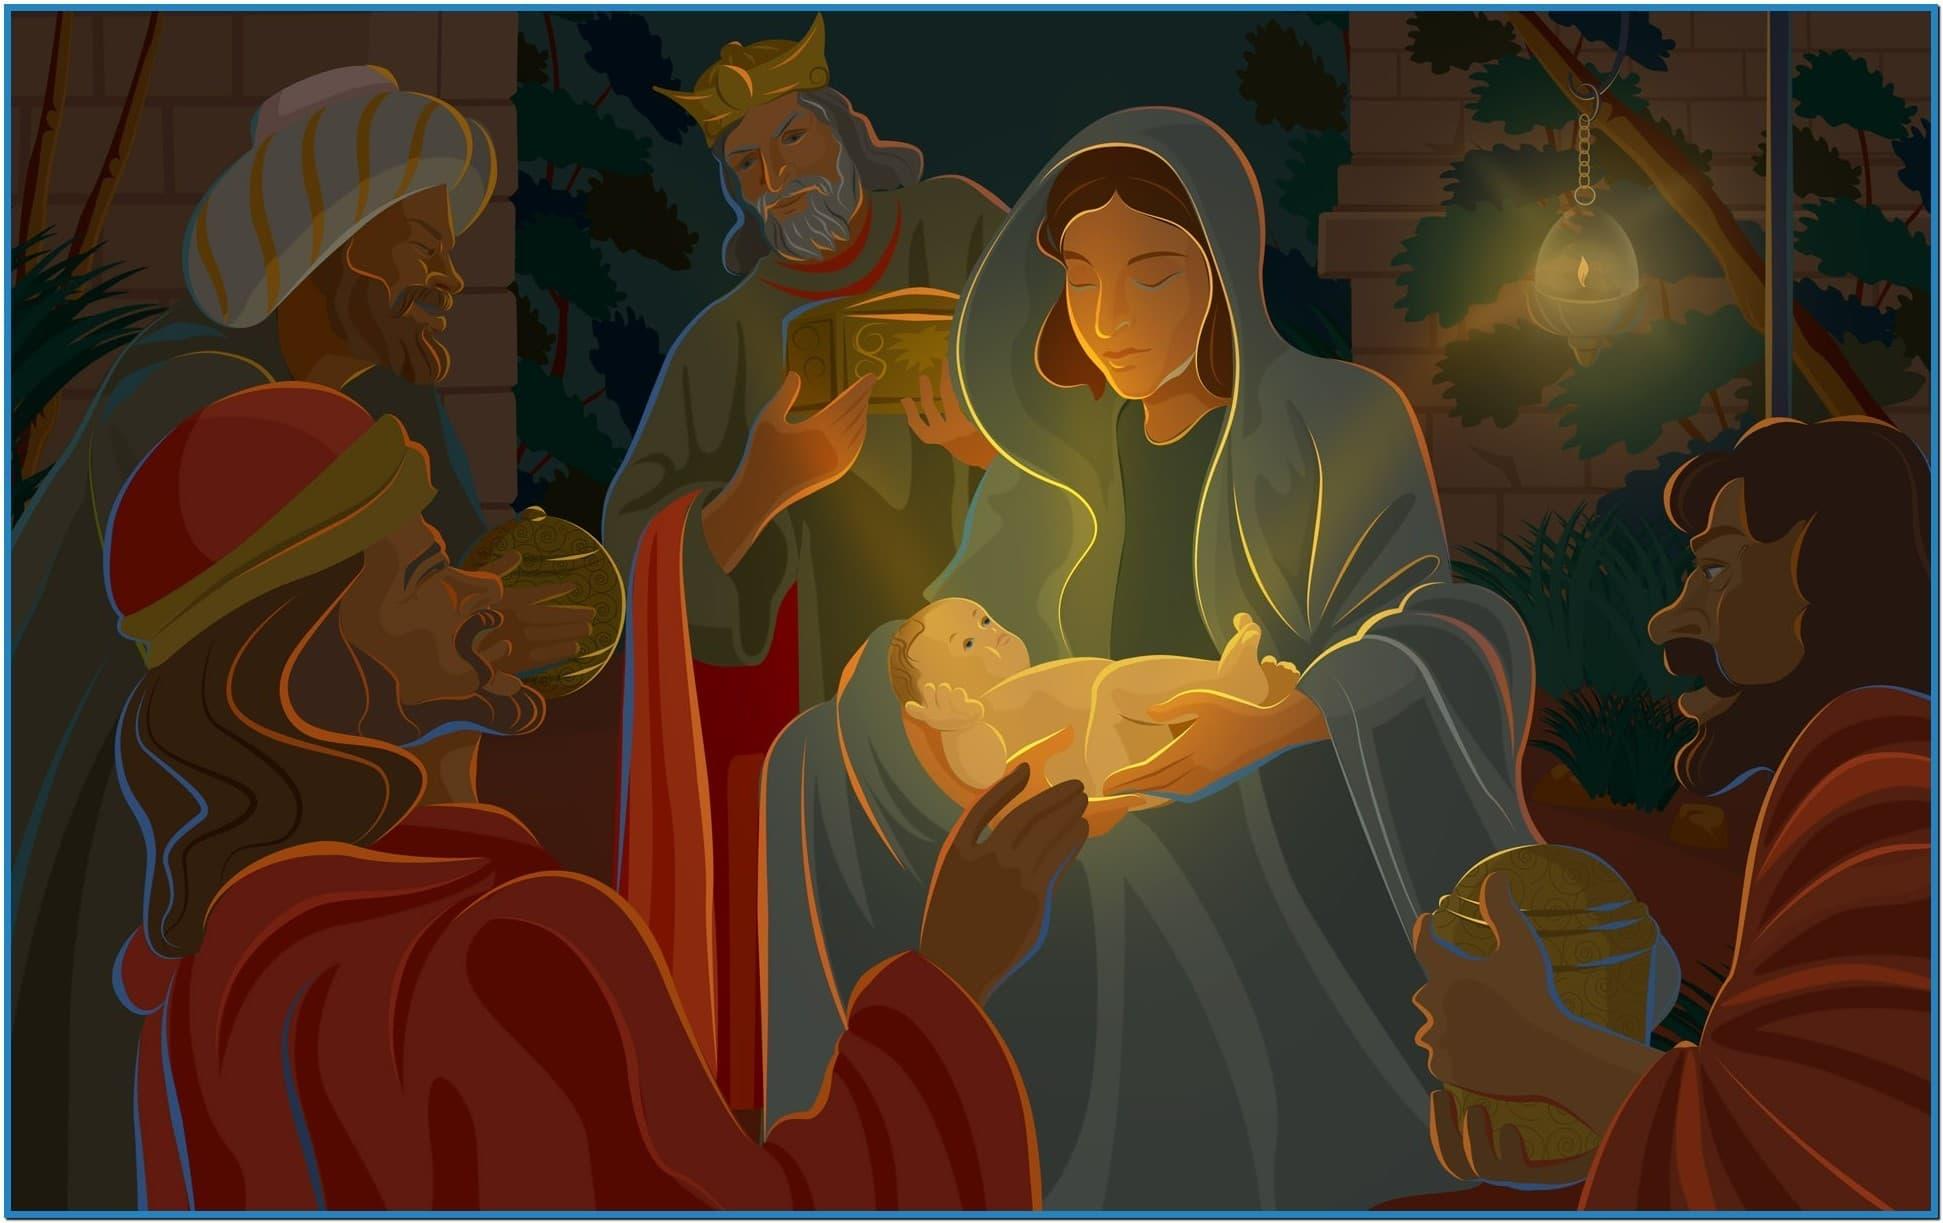 Christian christmas wallpapers and screensavers - Download free